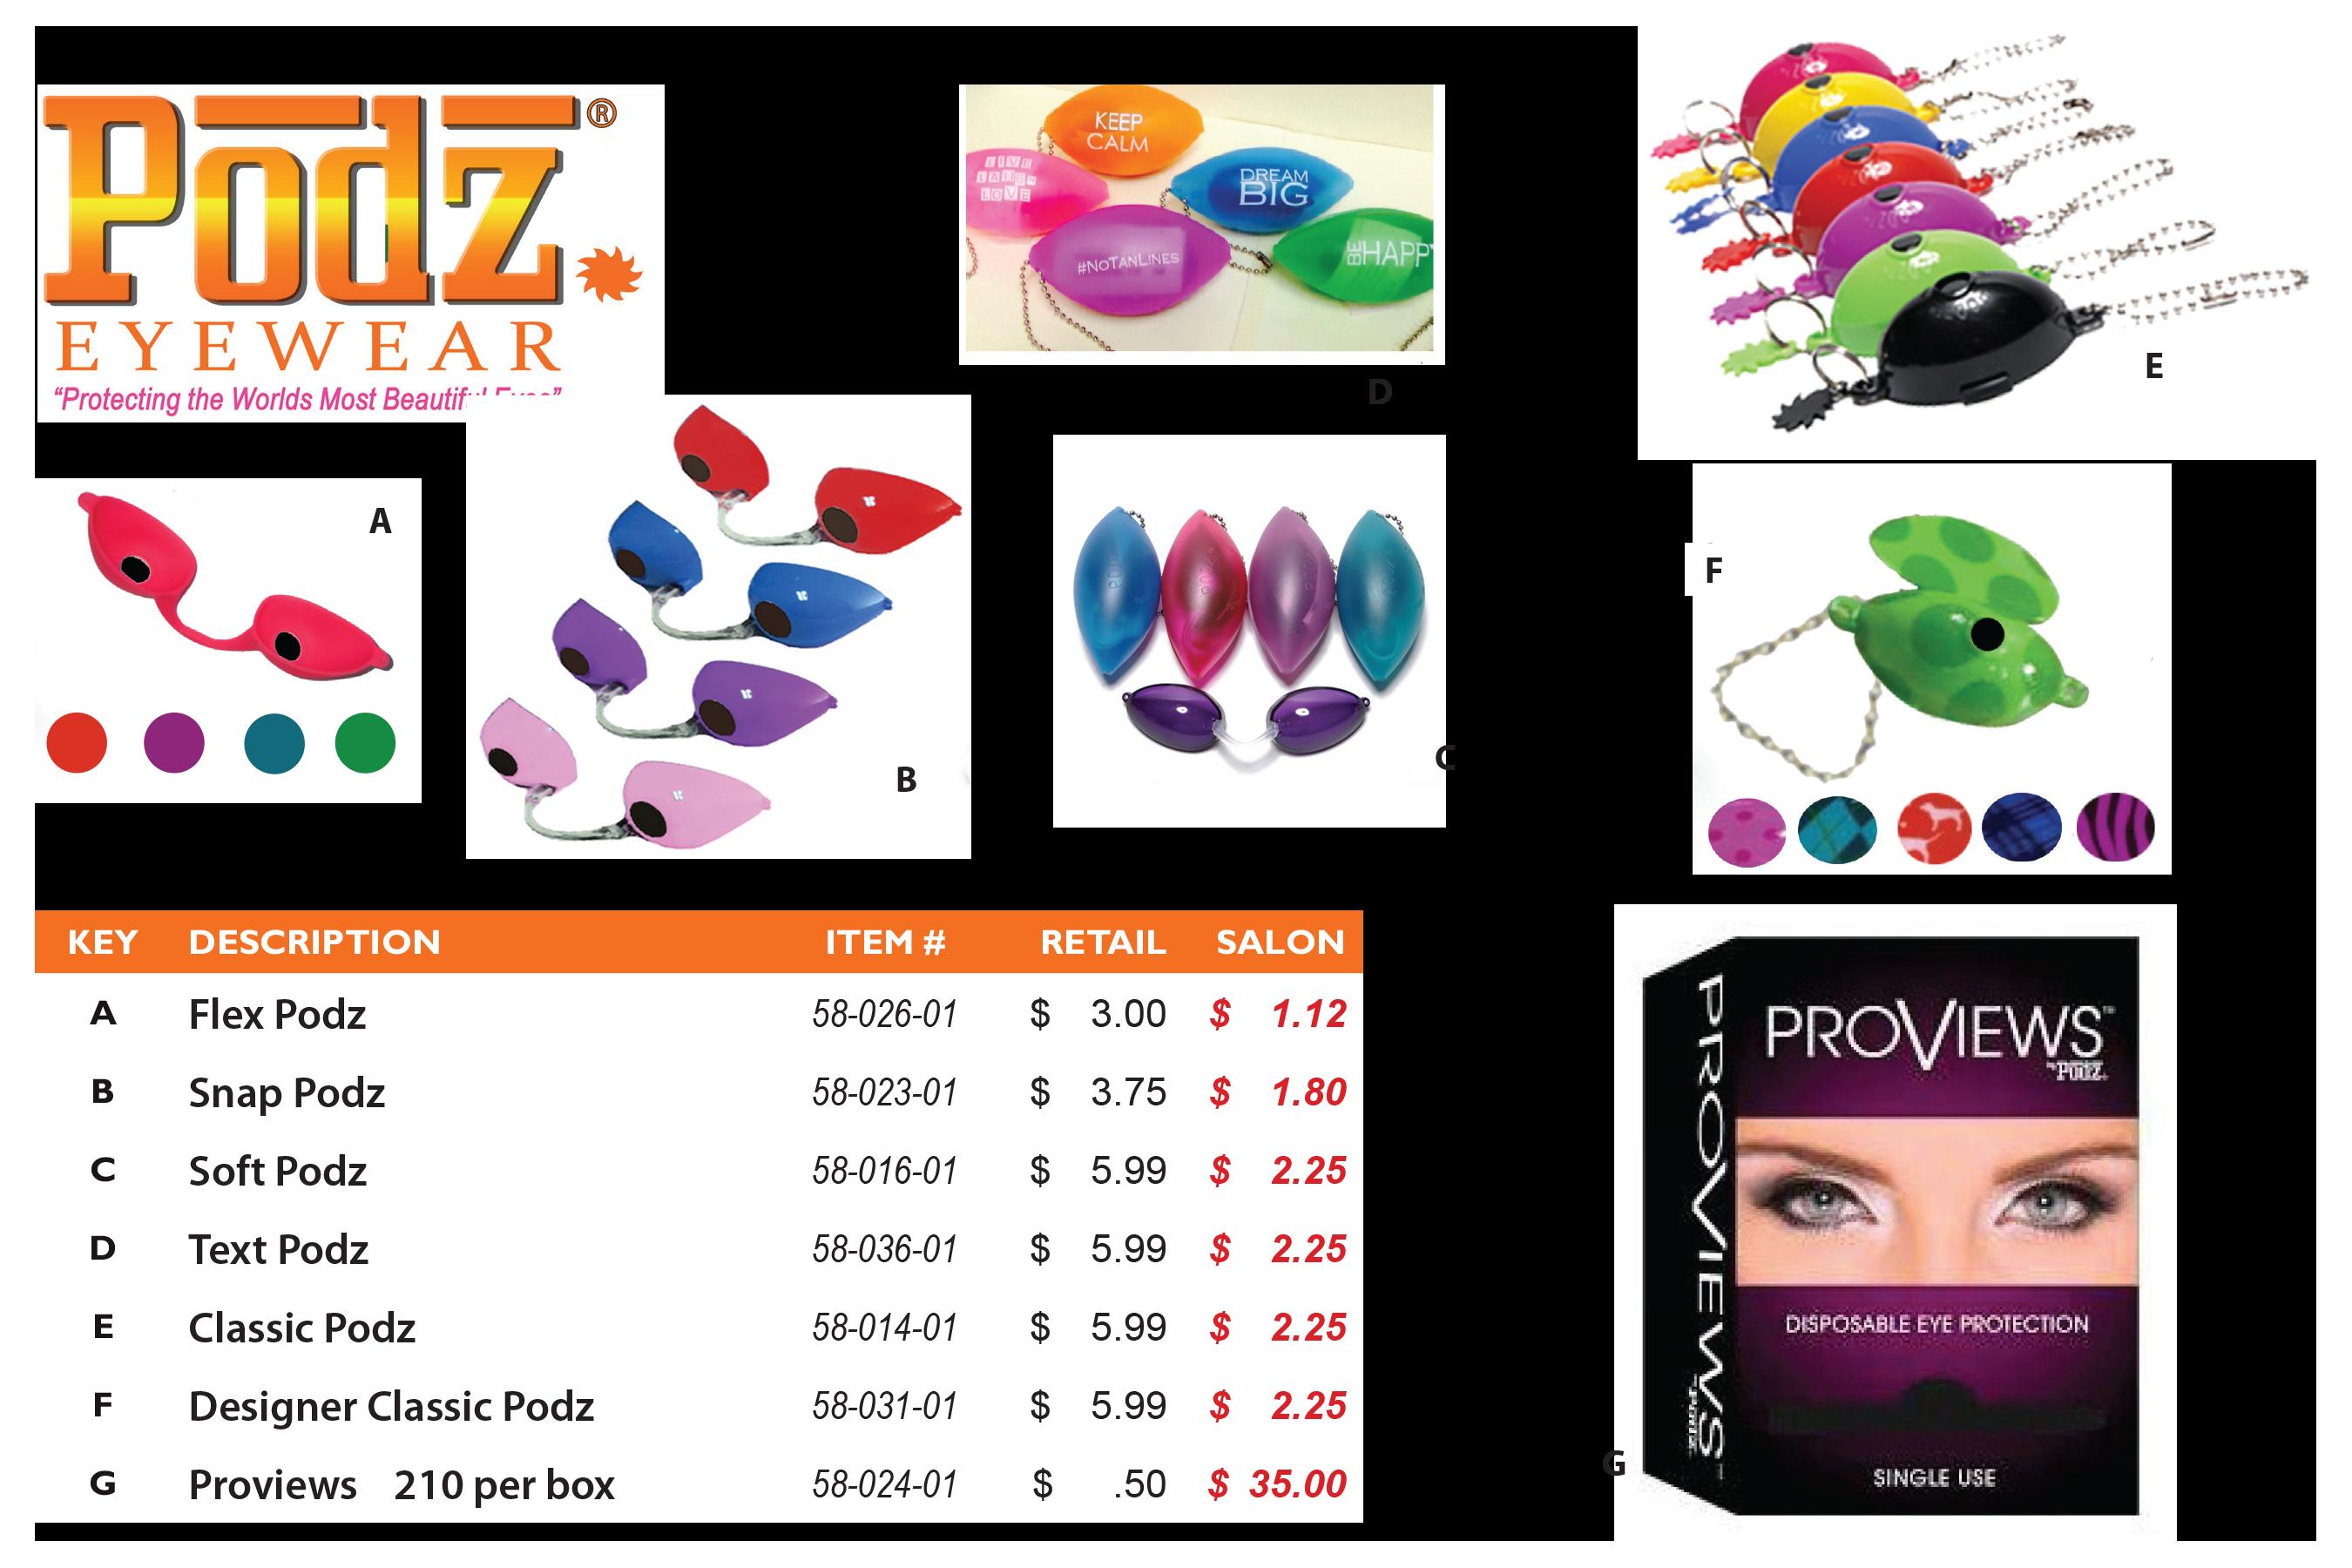 podz eyewear for tanning beds